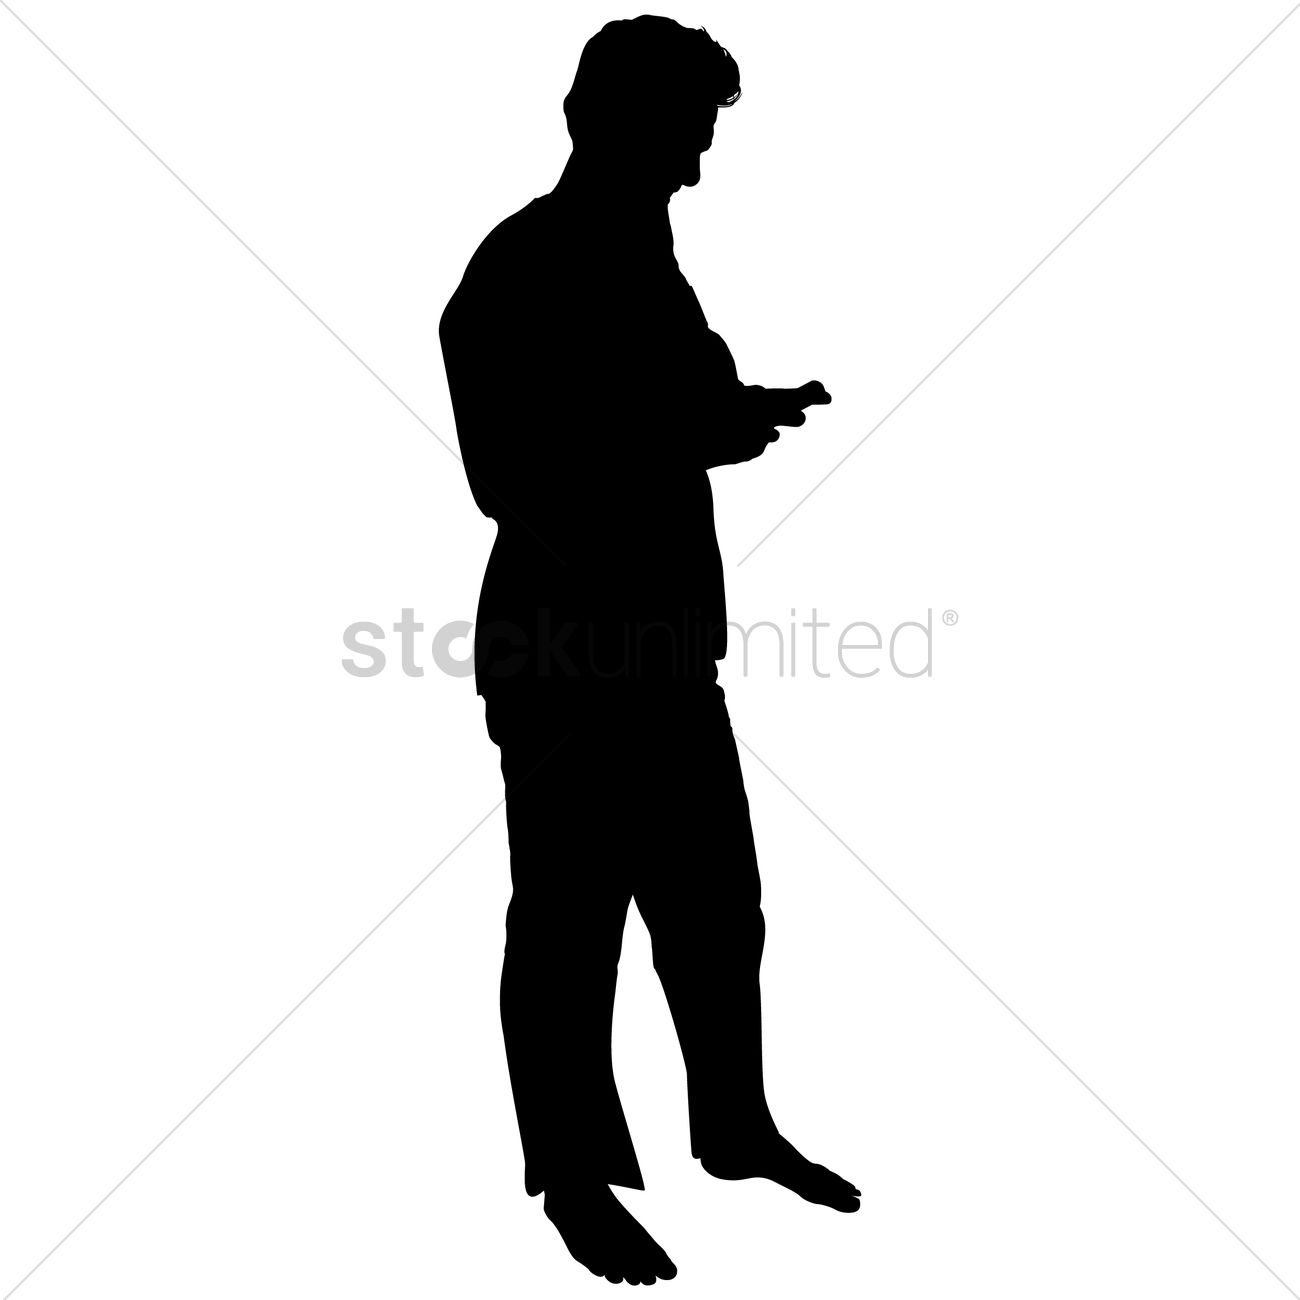 human silhouette vector at getdrawings com free for personal use rh getdrawings com human silhouette vector free download human silhouette vector free